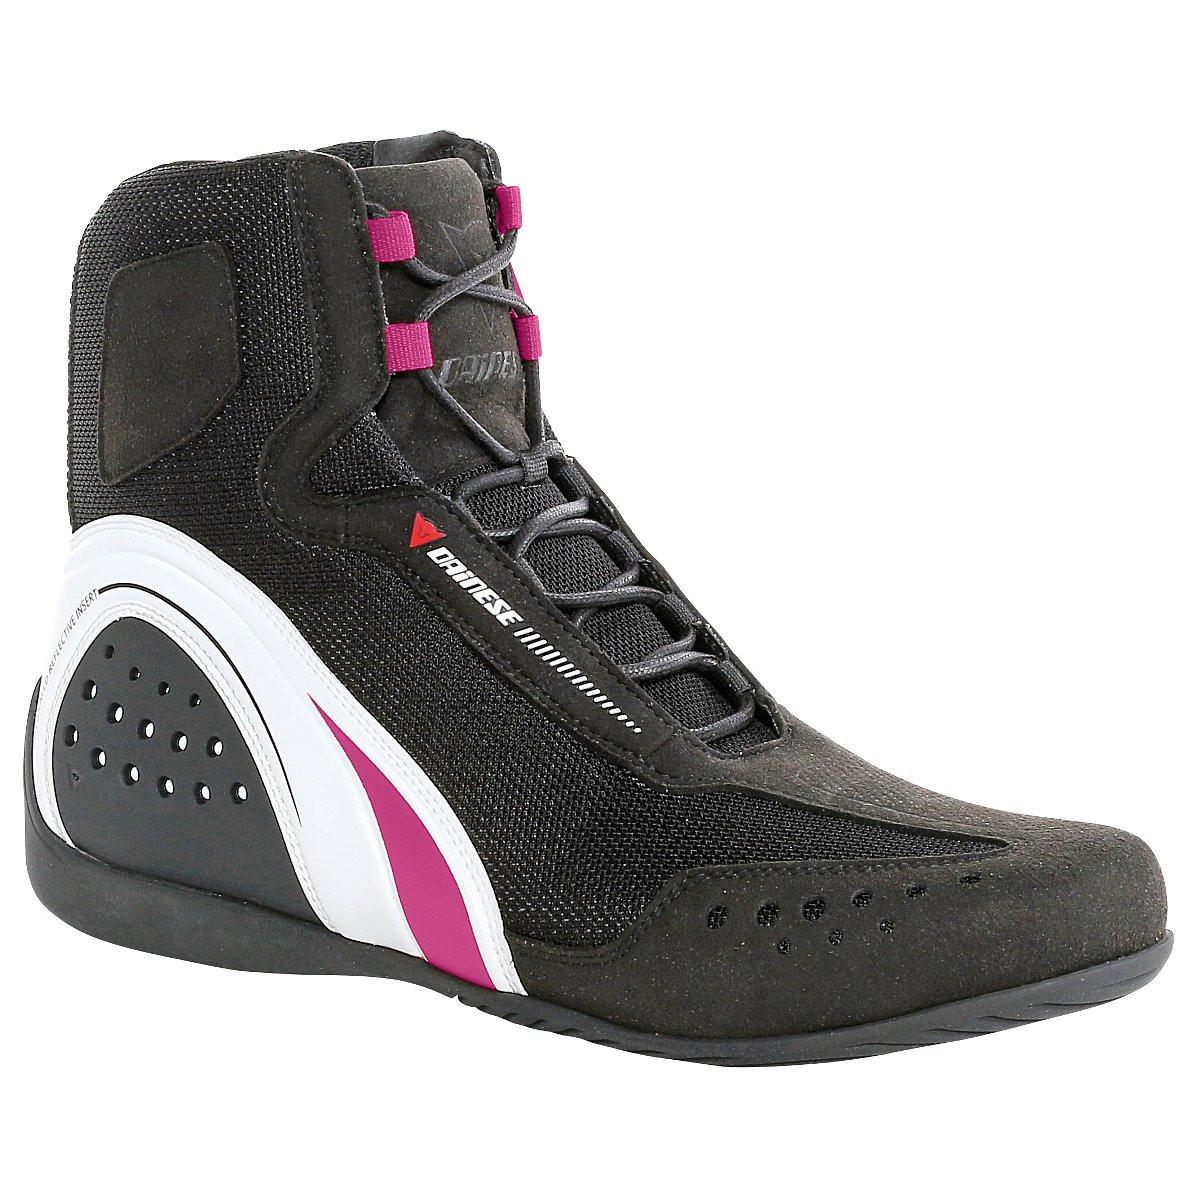 Dainese Motorshoe Air JB woman shoes Black White Fuchsia